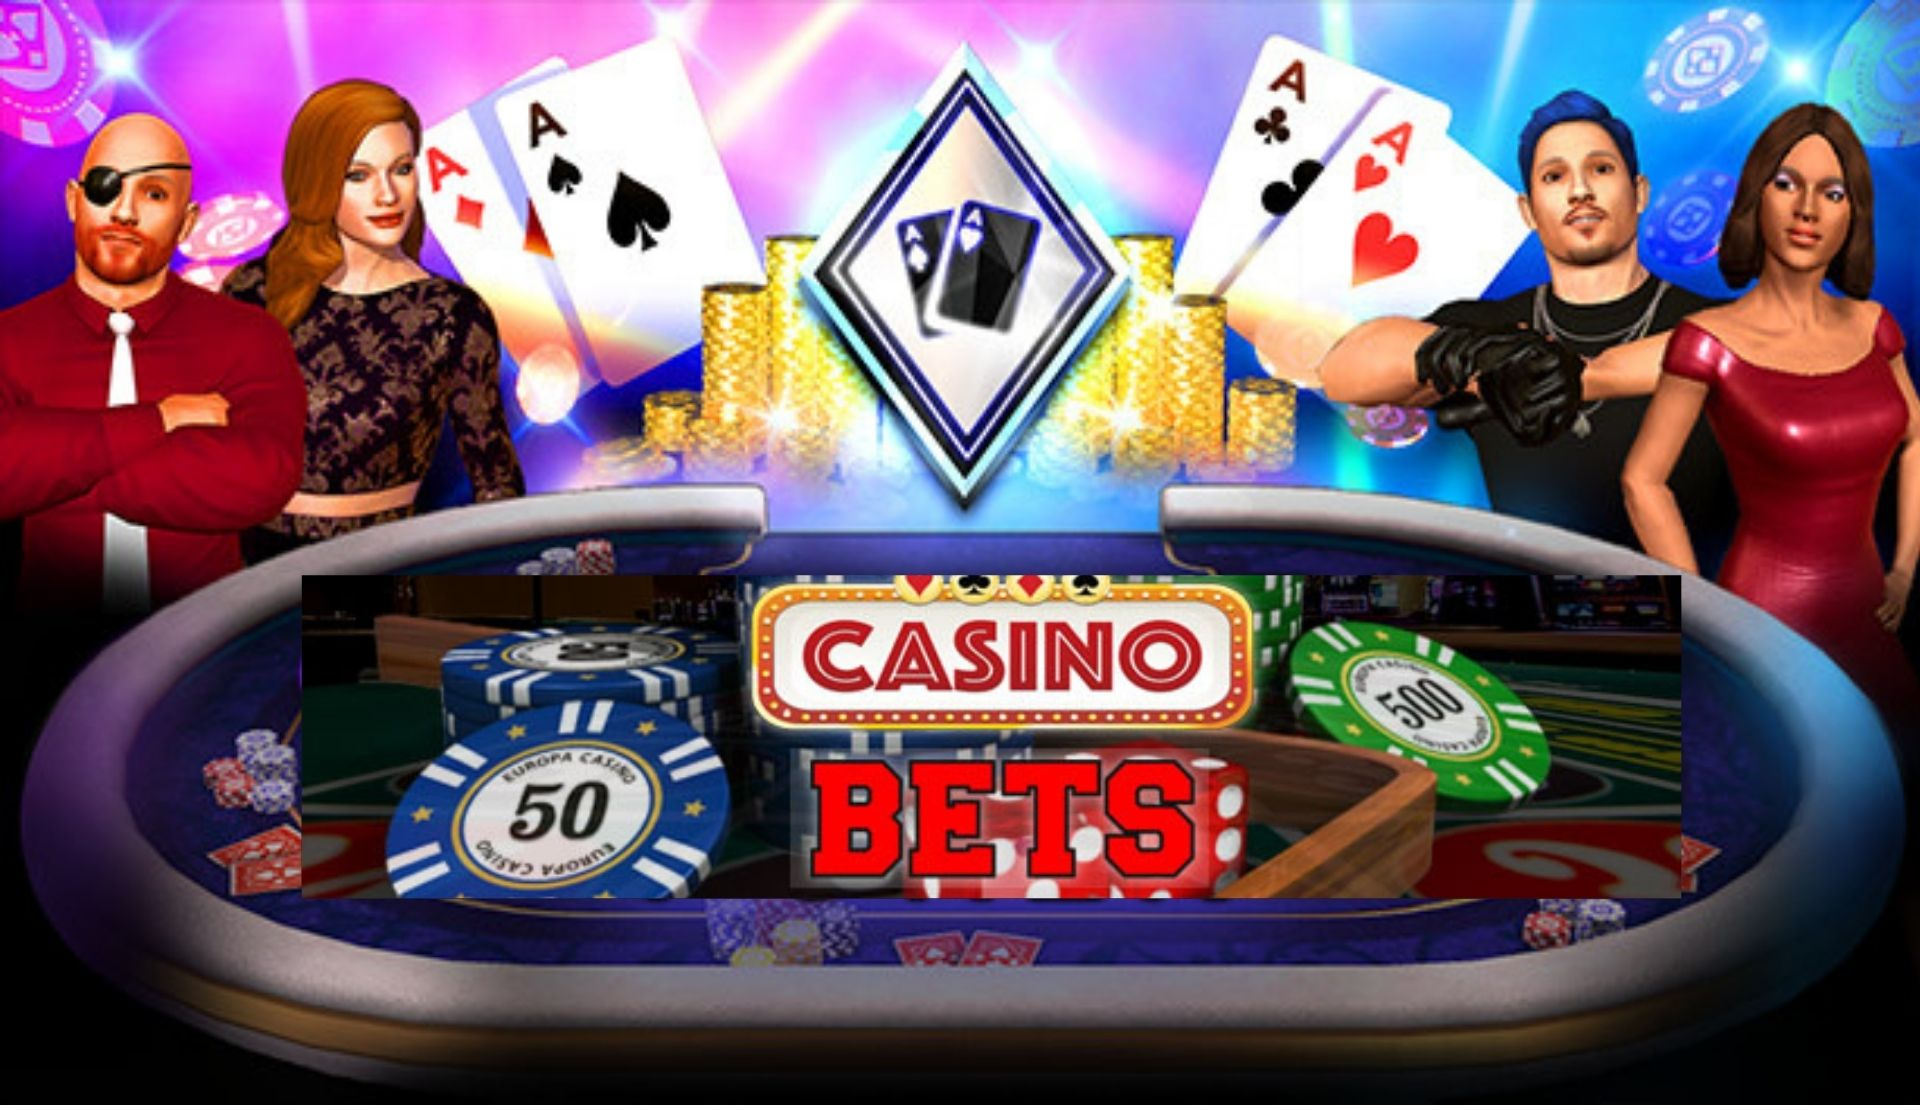 Permanent 2000+ powerfull Casino,  Gambling,  Poker,  Sports Betting High Quality Web2.0 Backlinks